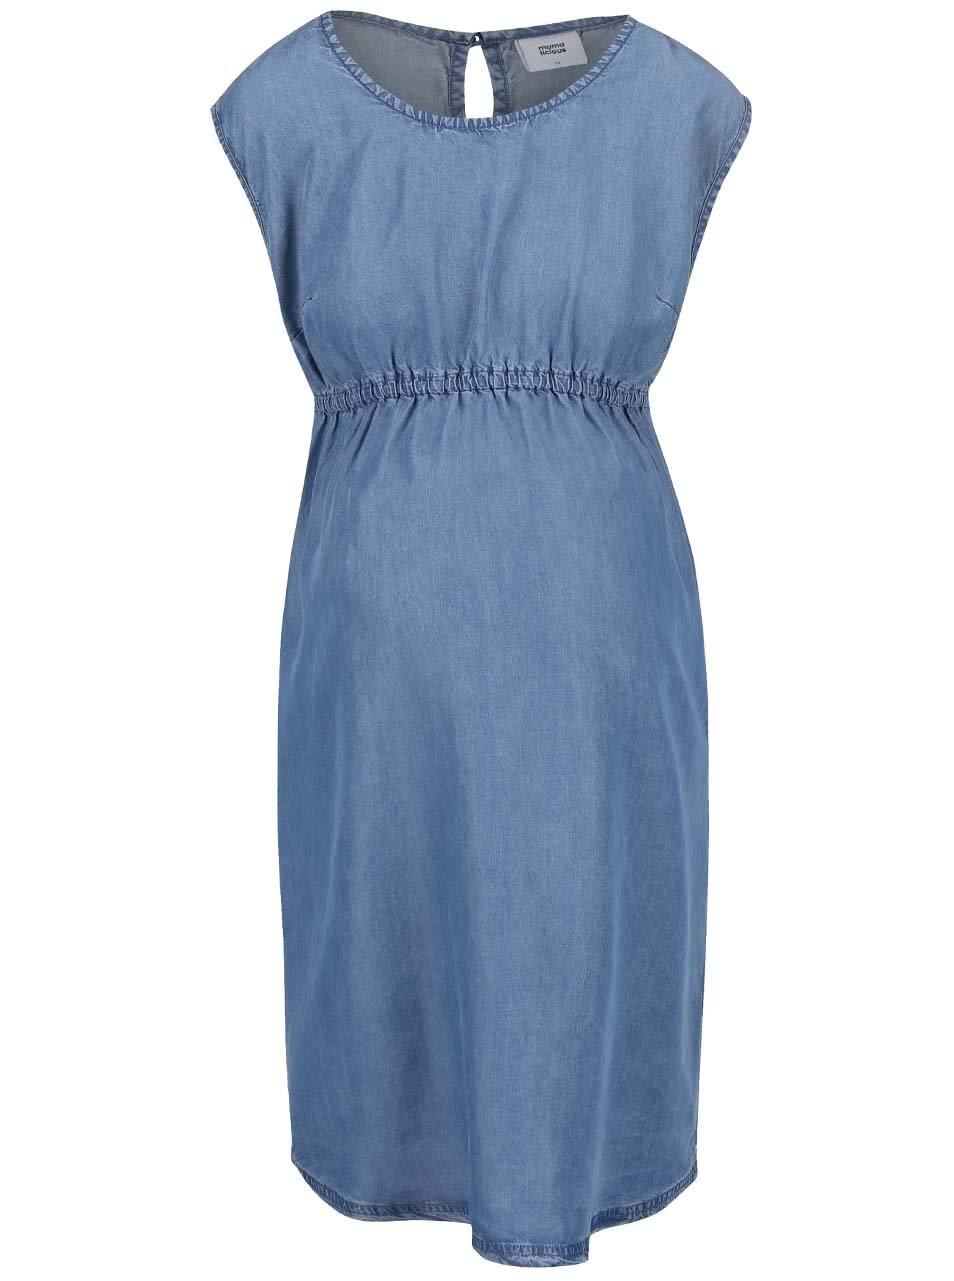 89a5af3c5e7b Modré rifľové tehotenské šaty Mama.licious Teresa ...